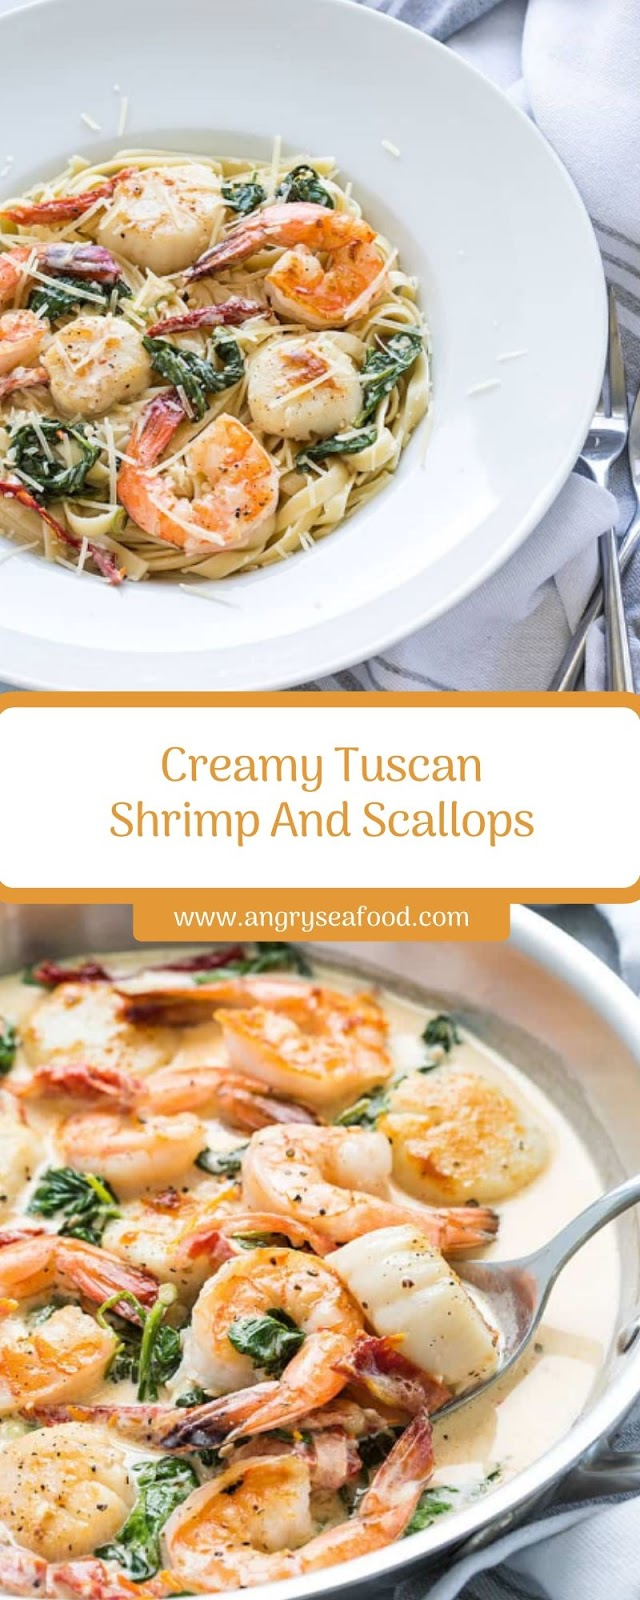 Creamy Tuscan Shrimp And Scallops